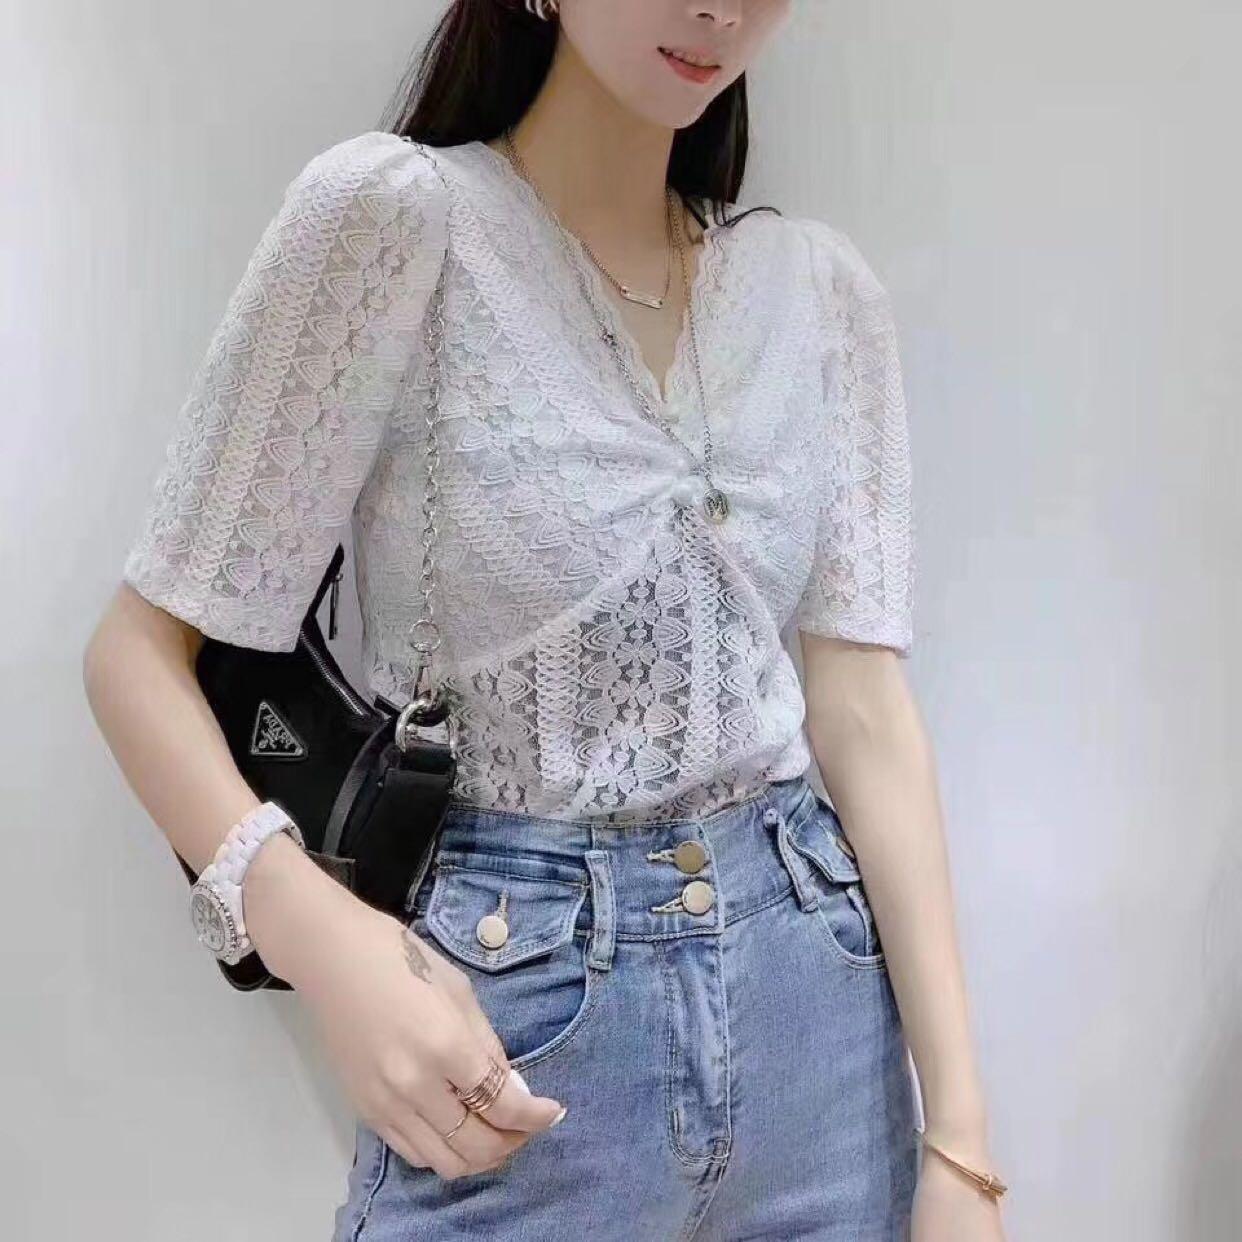 Gula girls dress lace top T-shirt